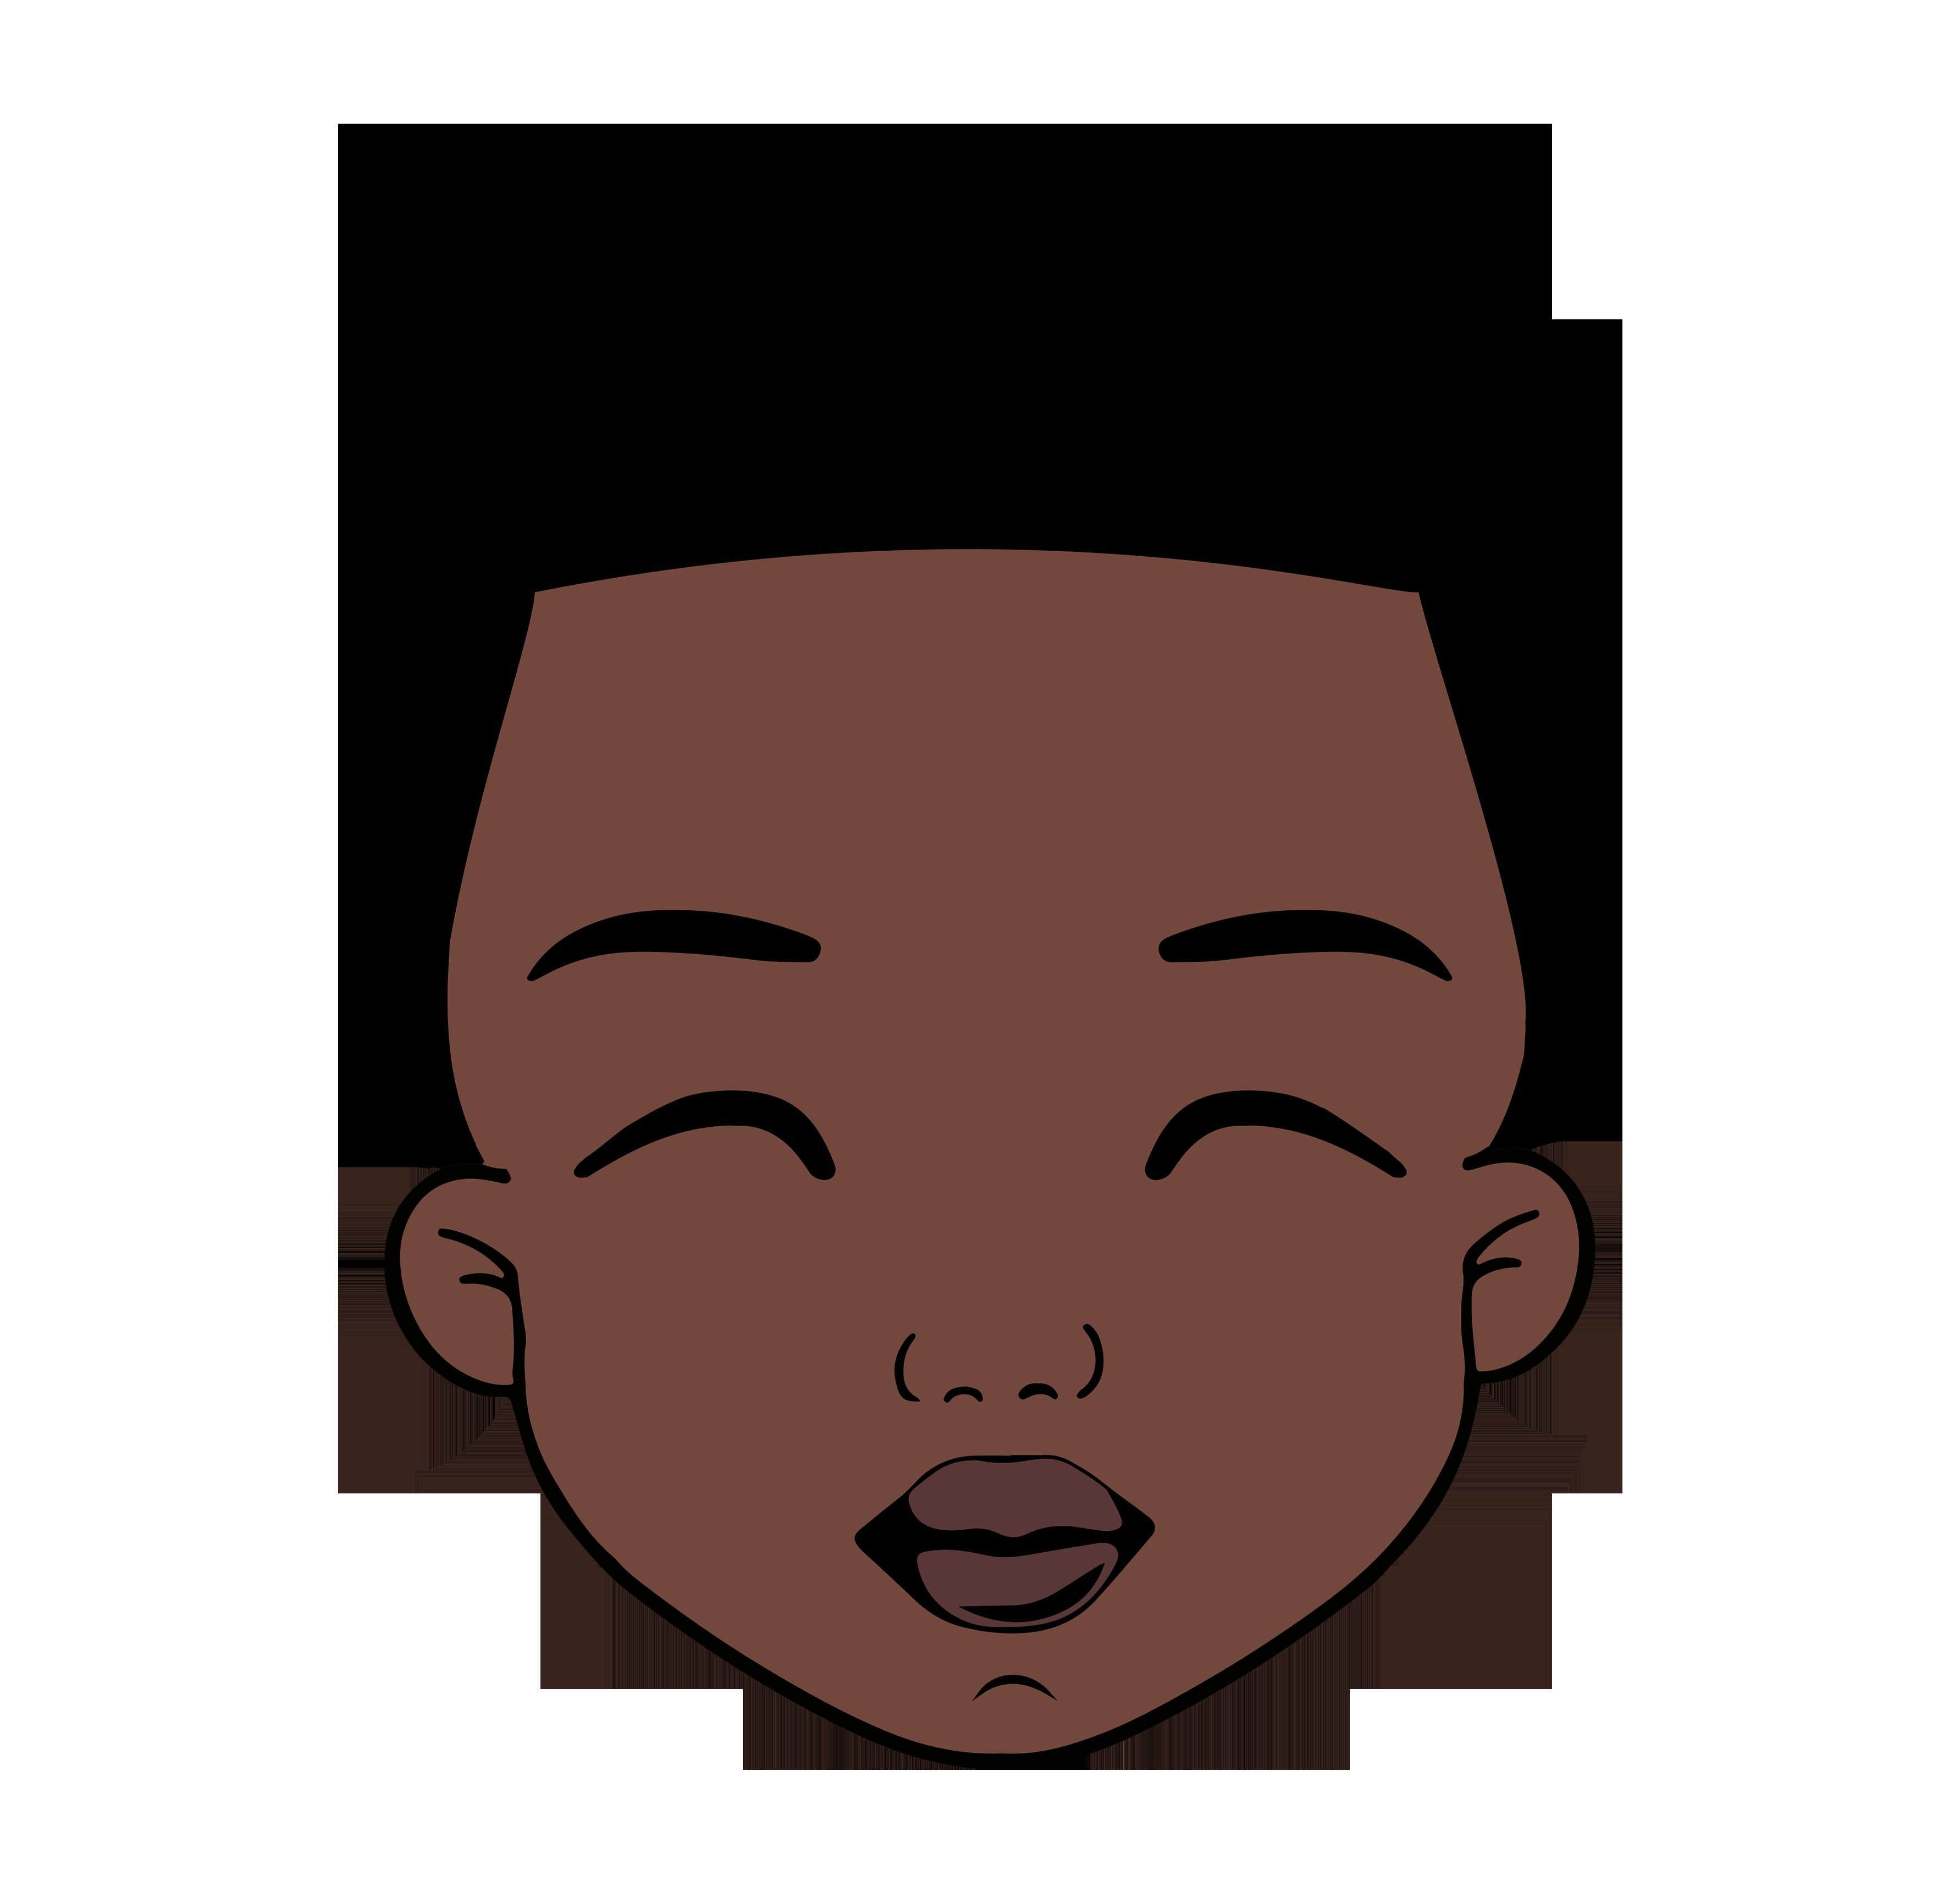 DIDIKO designs Cute Afro Puff Girl SVG